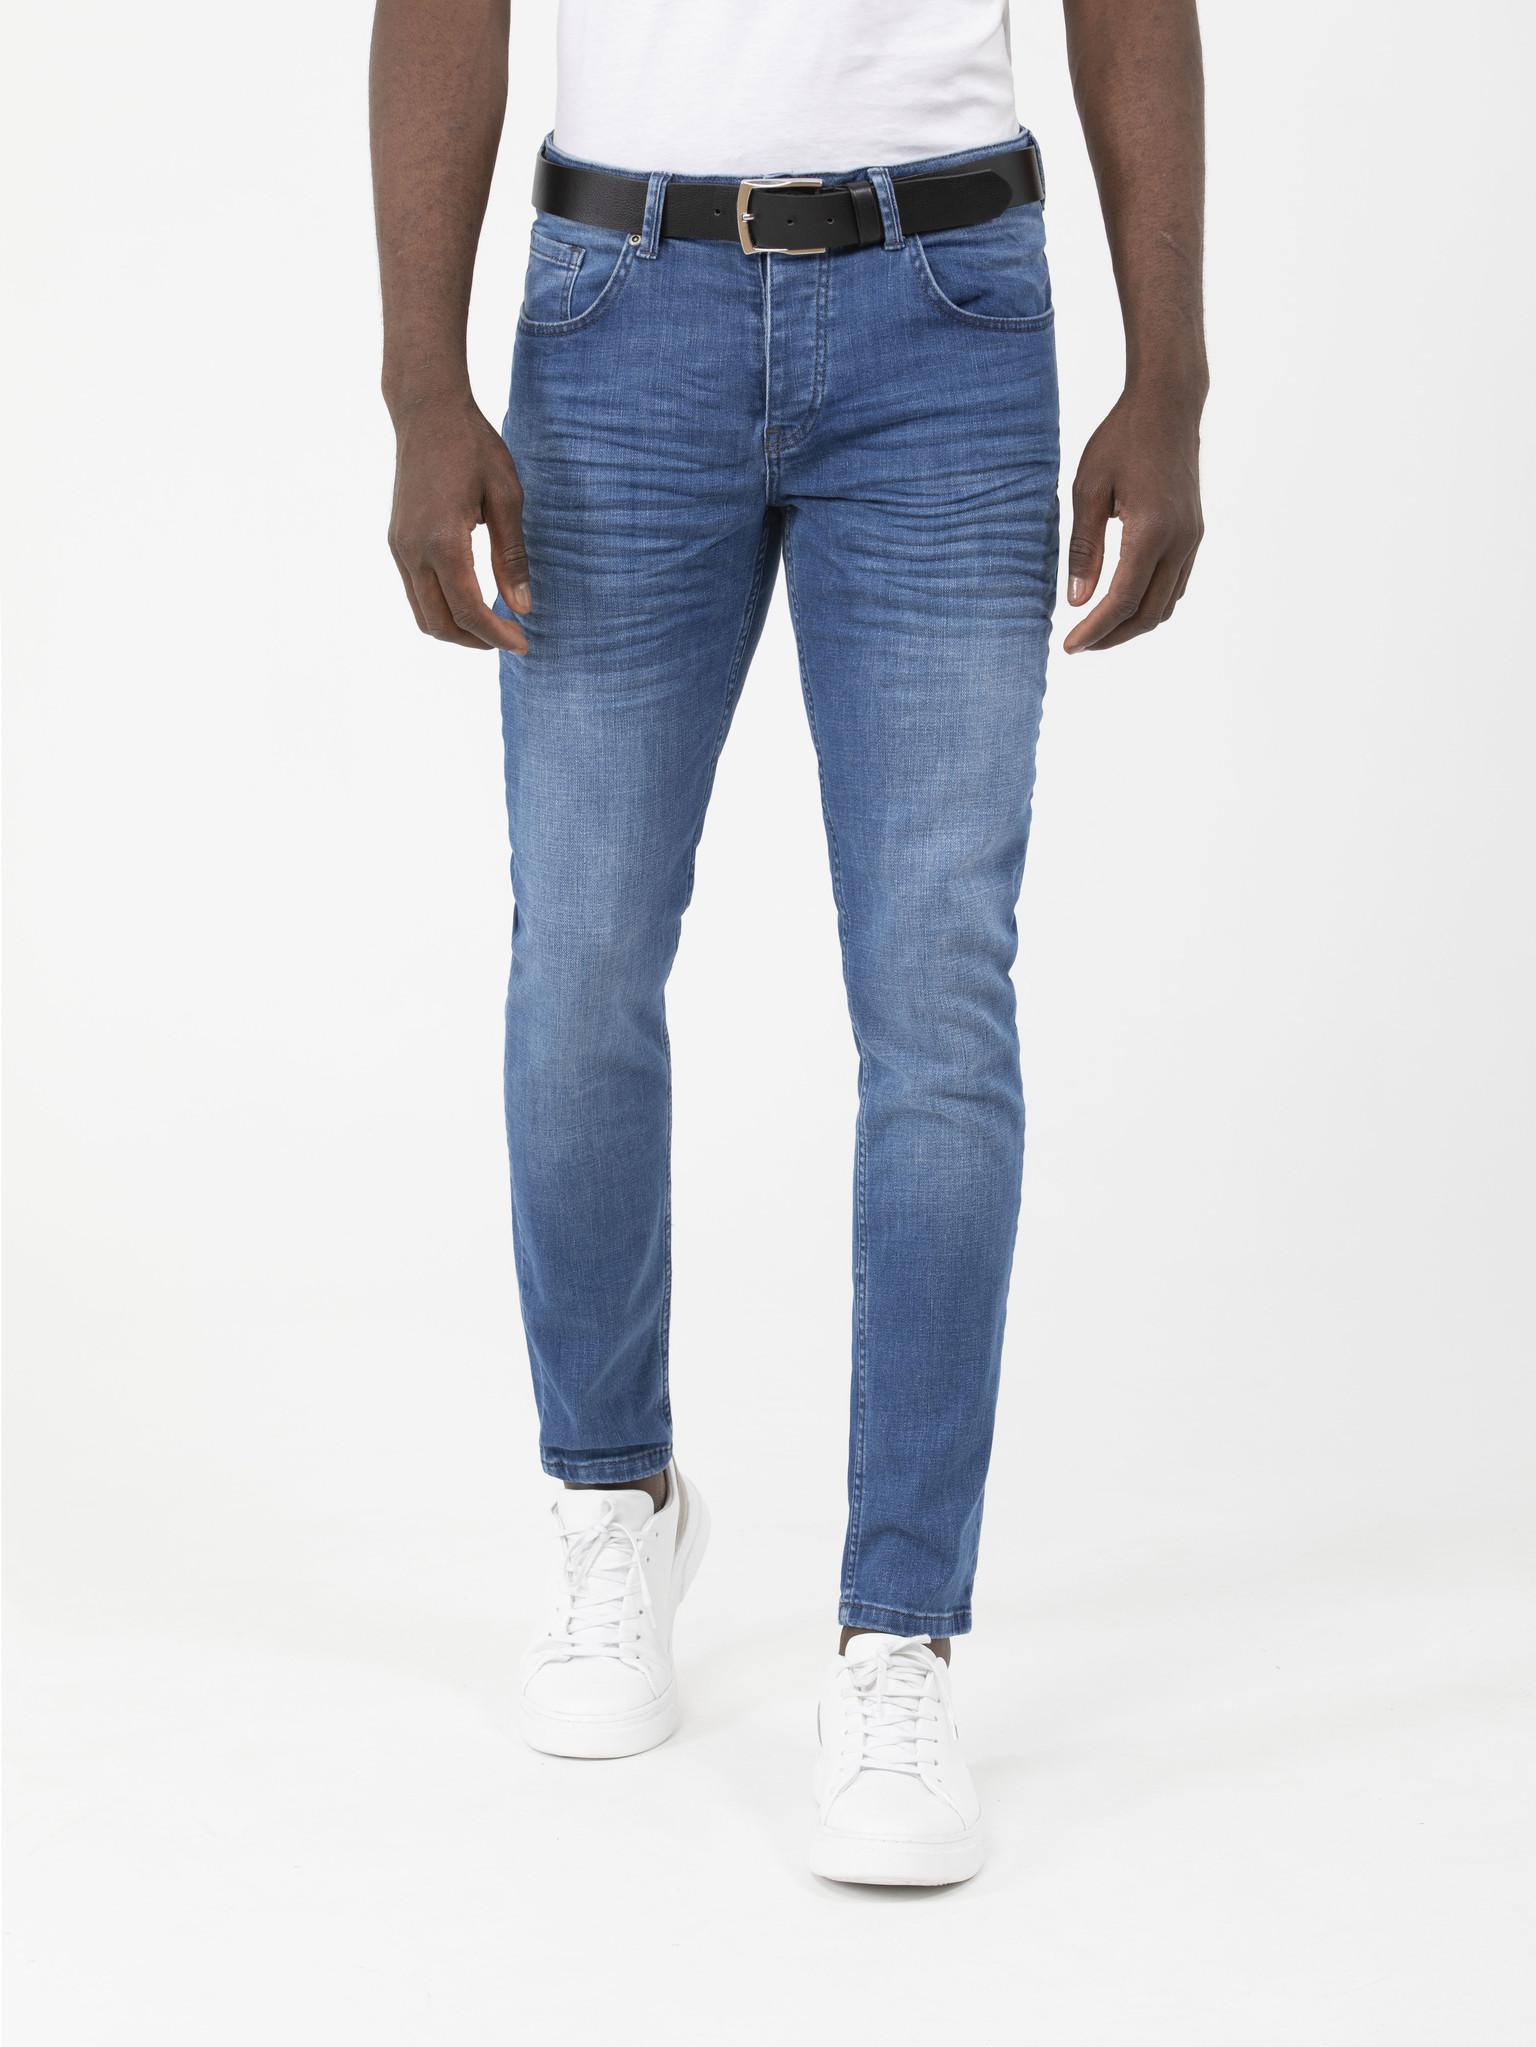 Arya Boy Jeans Erig Light Blue Maat: 33/30